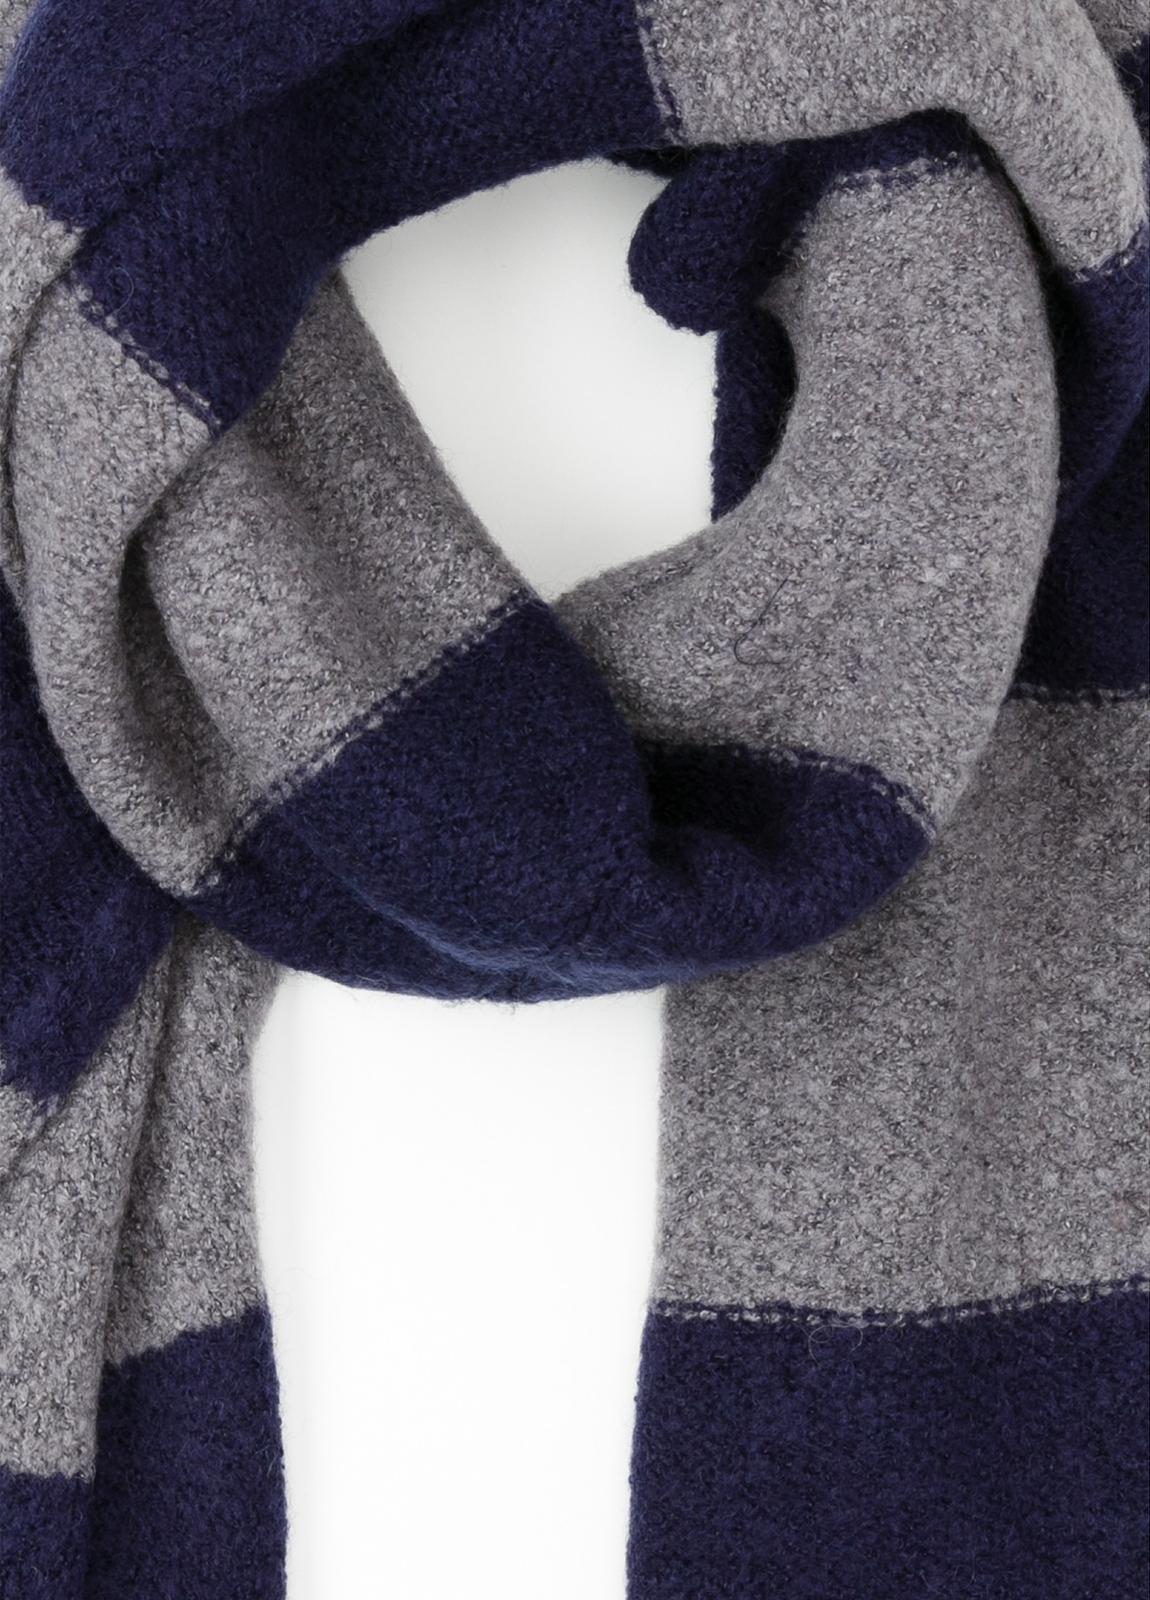 Bufanda de rayas anchas color azul, 180 x 40 cm, mezcla de lana cepillada. - Ítem1